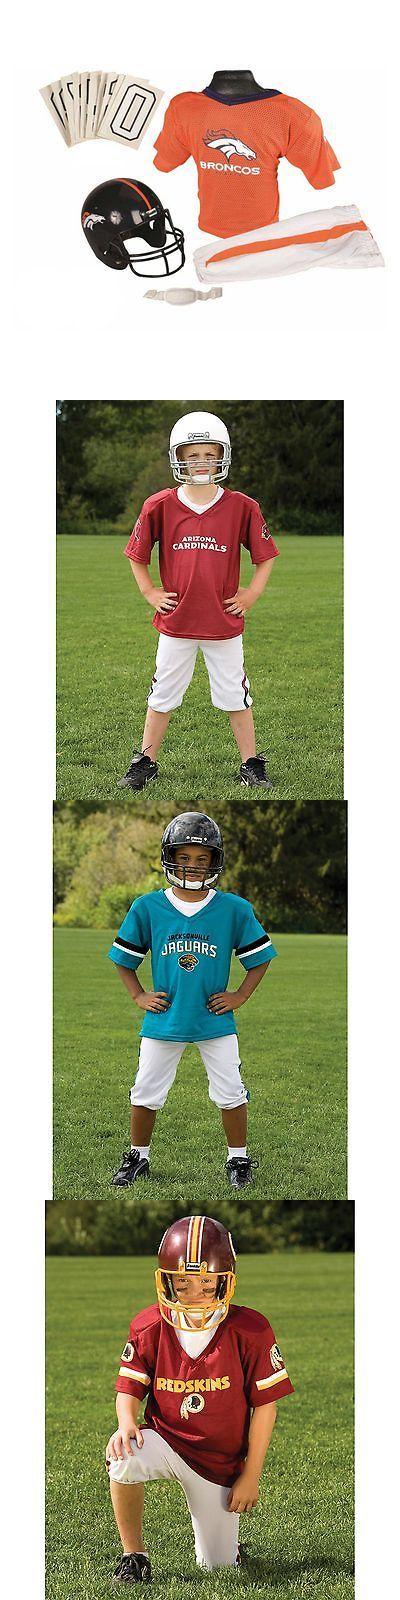 Other Backyard Games 159081: Franklin Sports Nfl Youth Uniform Set, Denver Broncos, Small, Denver Broncos, -> BUY IT NOW ONLY: $43.04 on eBay!